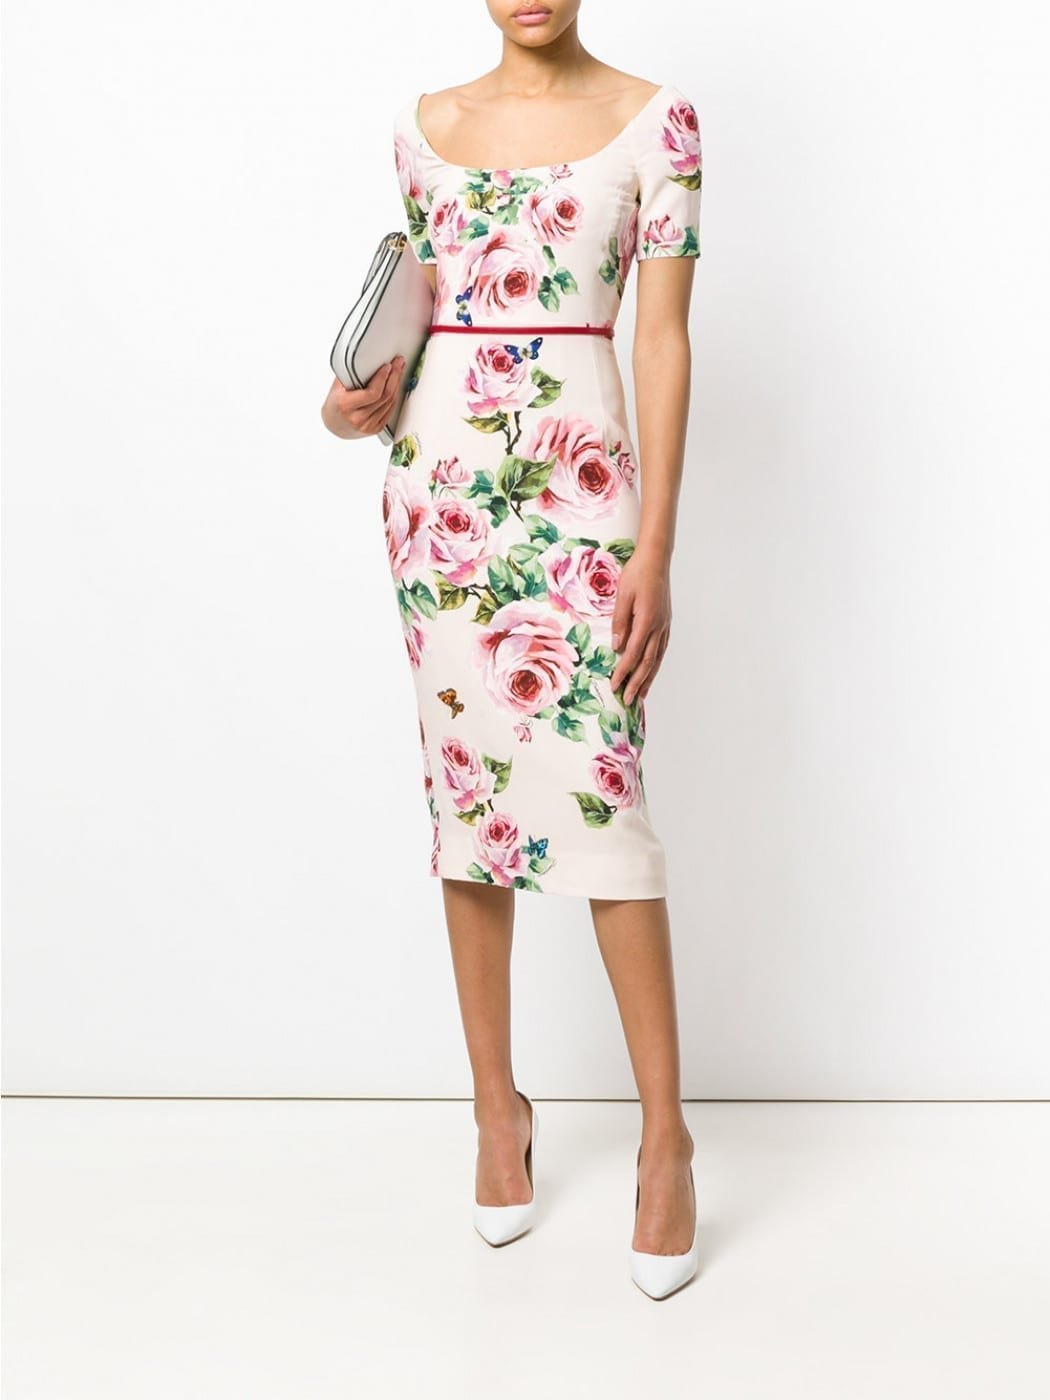 Dolce Amp Gabbana Flower Print Light Pink Dress We Select